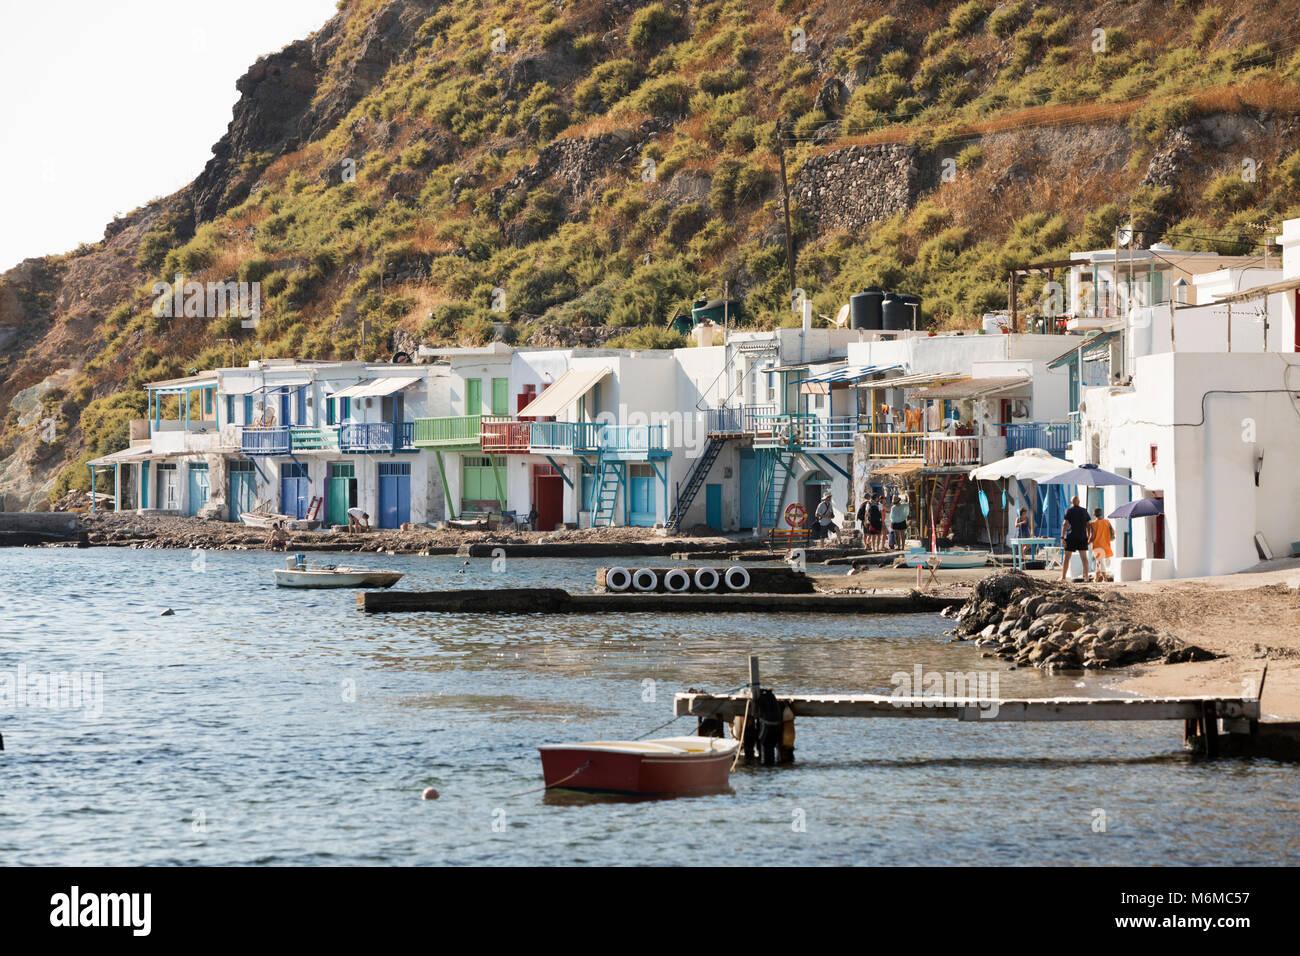 Colourful fishermen's boat houses, Klima, Milos, Cyclades, Aegean Sea, Greek Islands; Greece; Europe - Stock Image